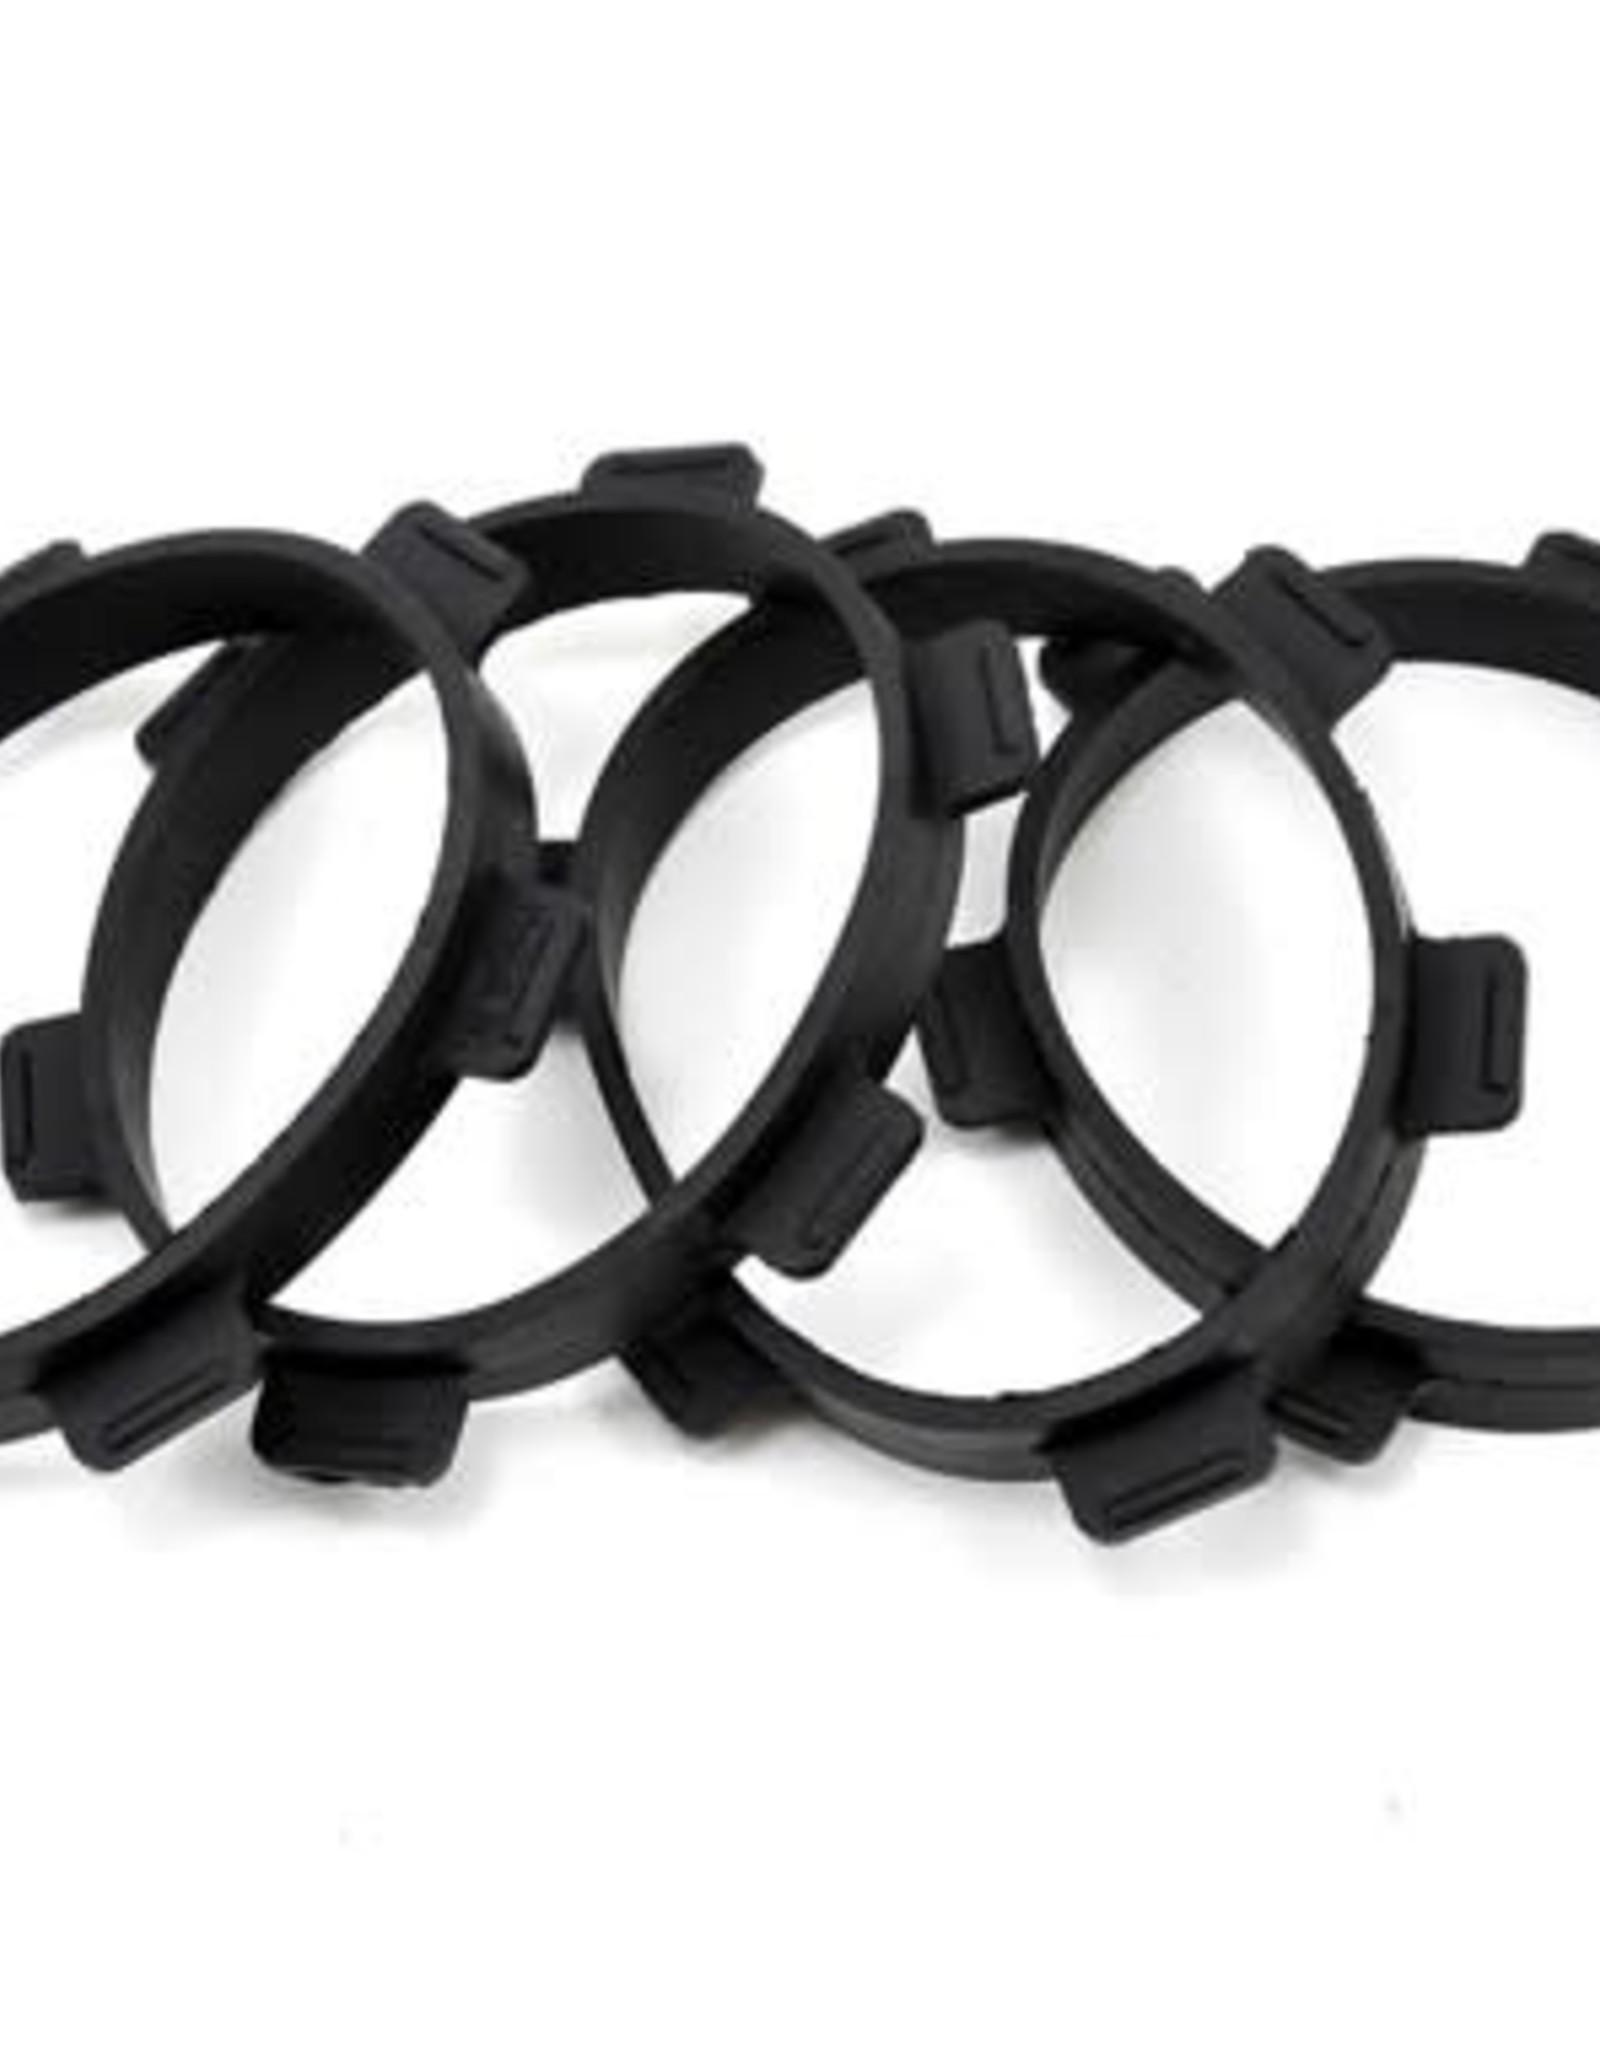 Protek RC ProTek RC 1/8 Buggy & 1/10 Truck Tire Mounting Glue Bands (4)